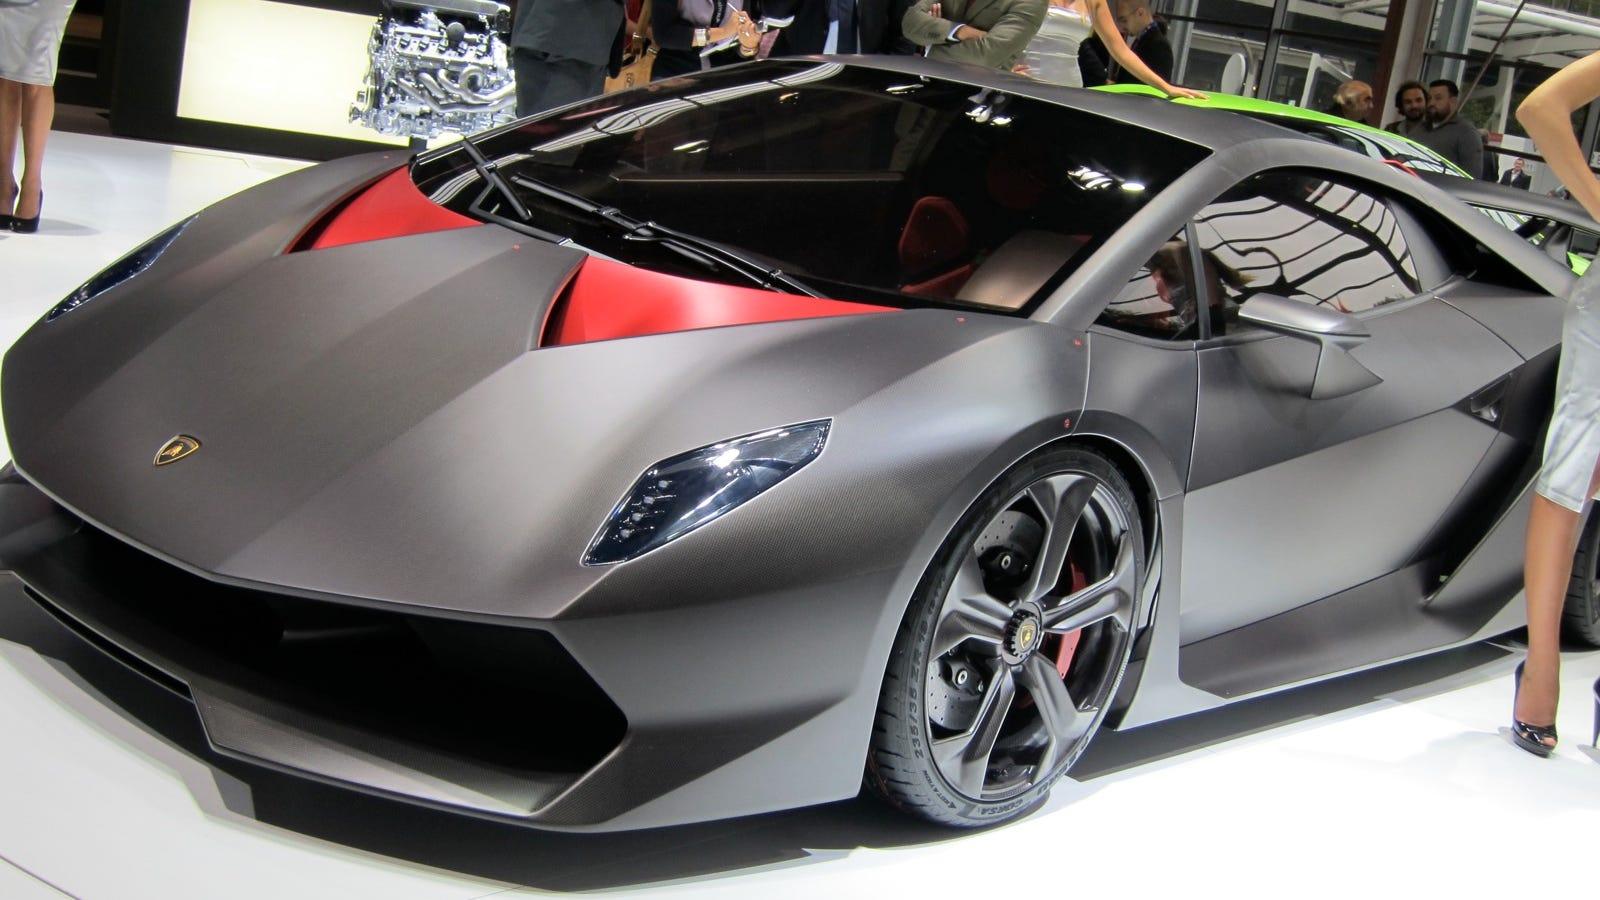 Lamborghini Sesto Elemento Carbon Fiber And Hot Air